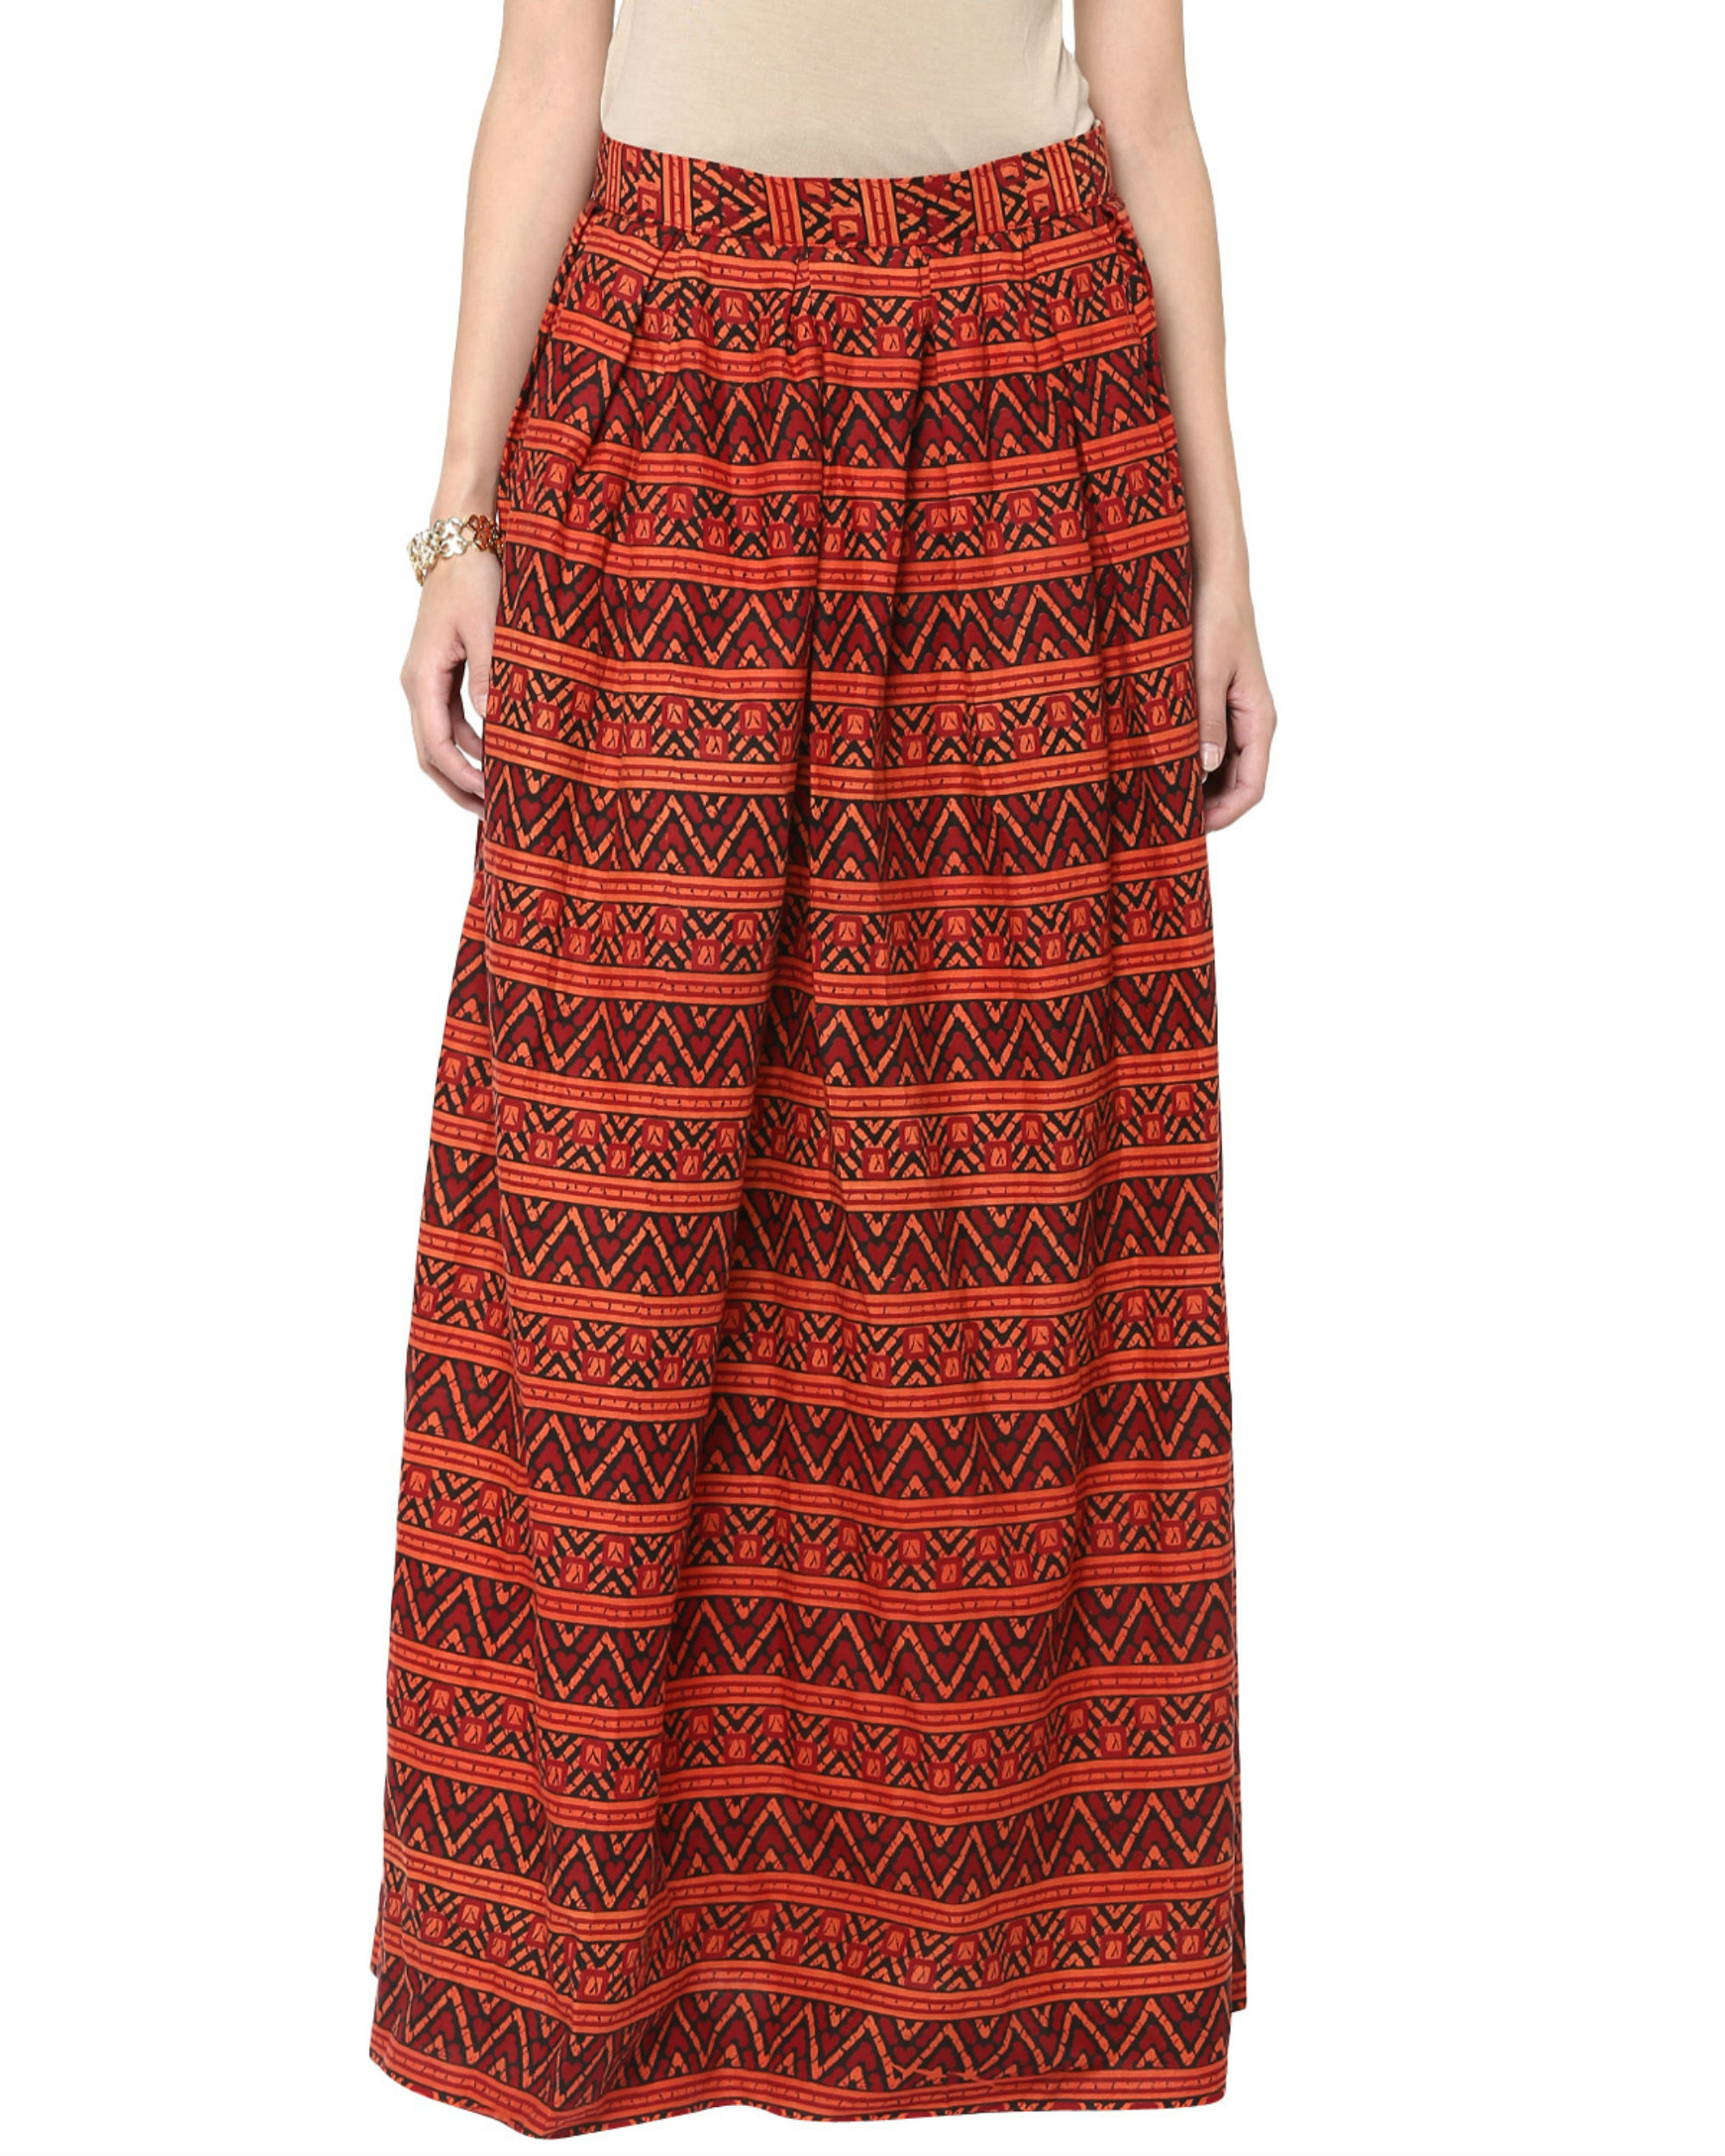 Brick long skirt